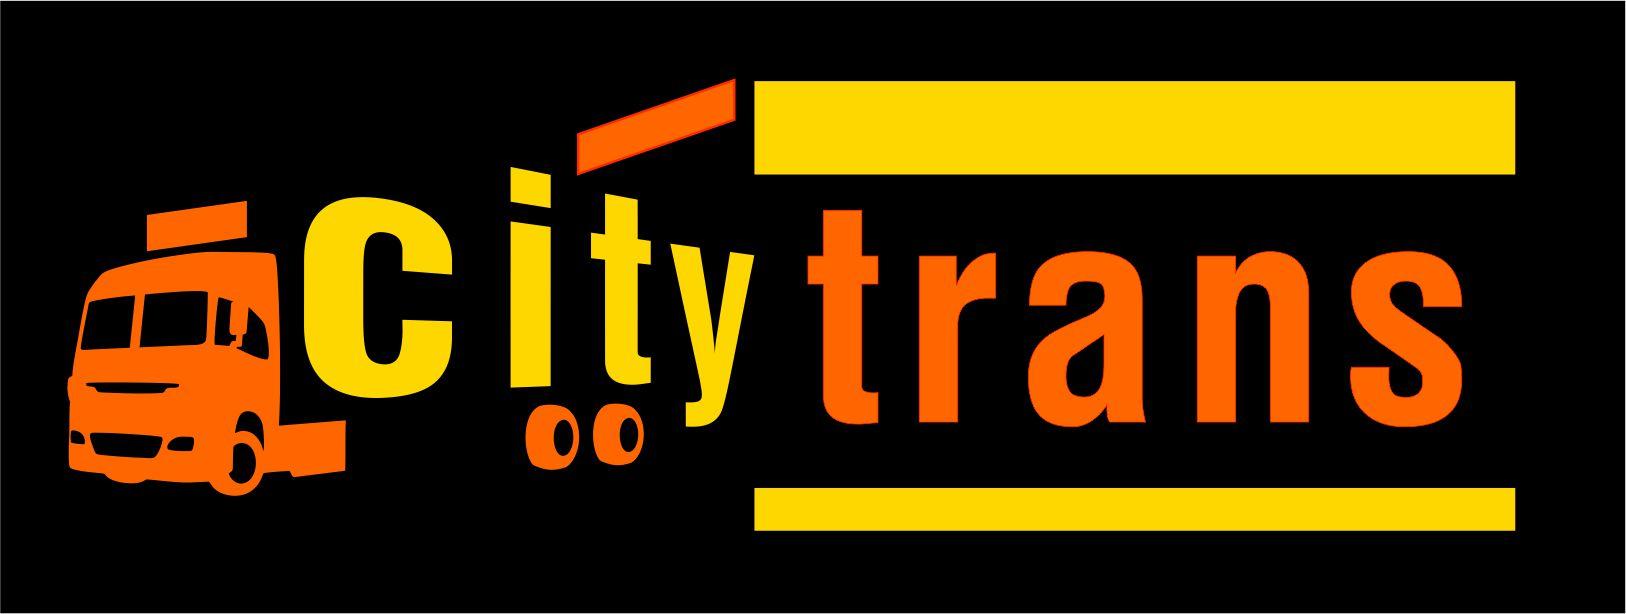 Разработка Логотипа транспортной компании фото f_7965e6fe663904d9.jpg